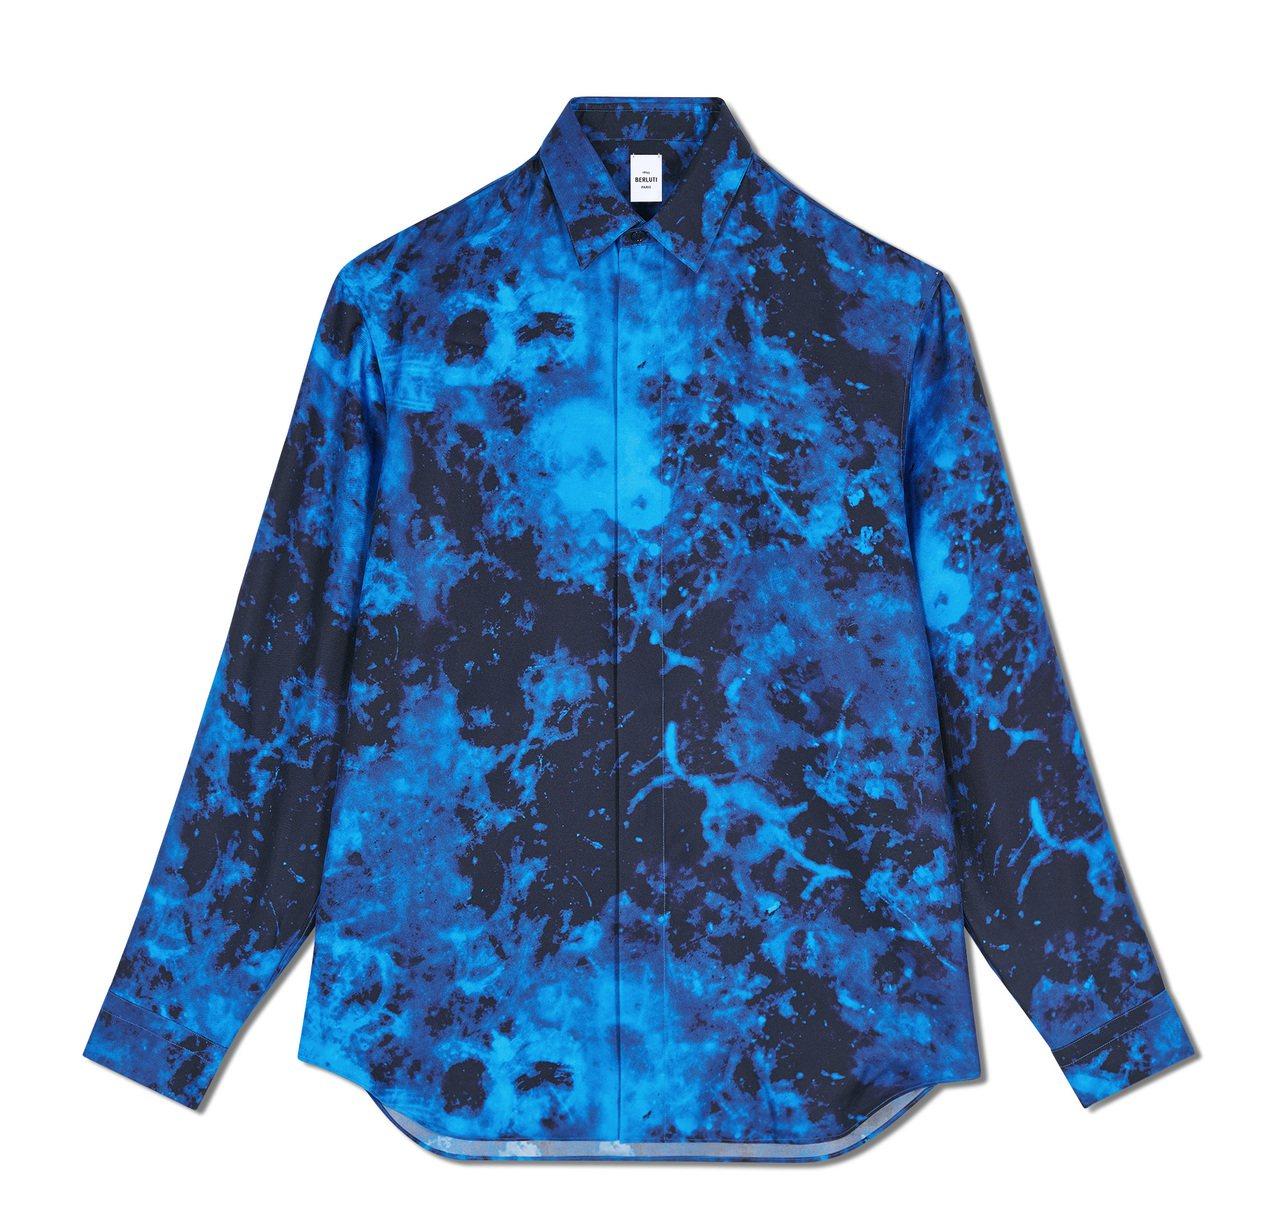 Berluti大理石紋藍色真絲襯衫34,500元。圖/Berluti提供